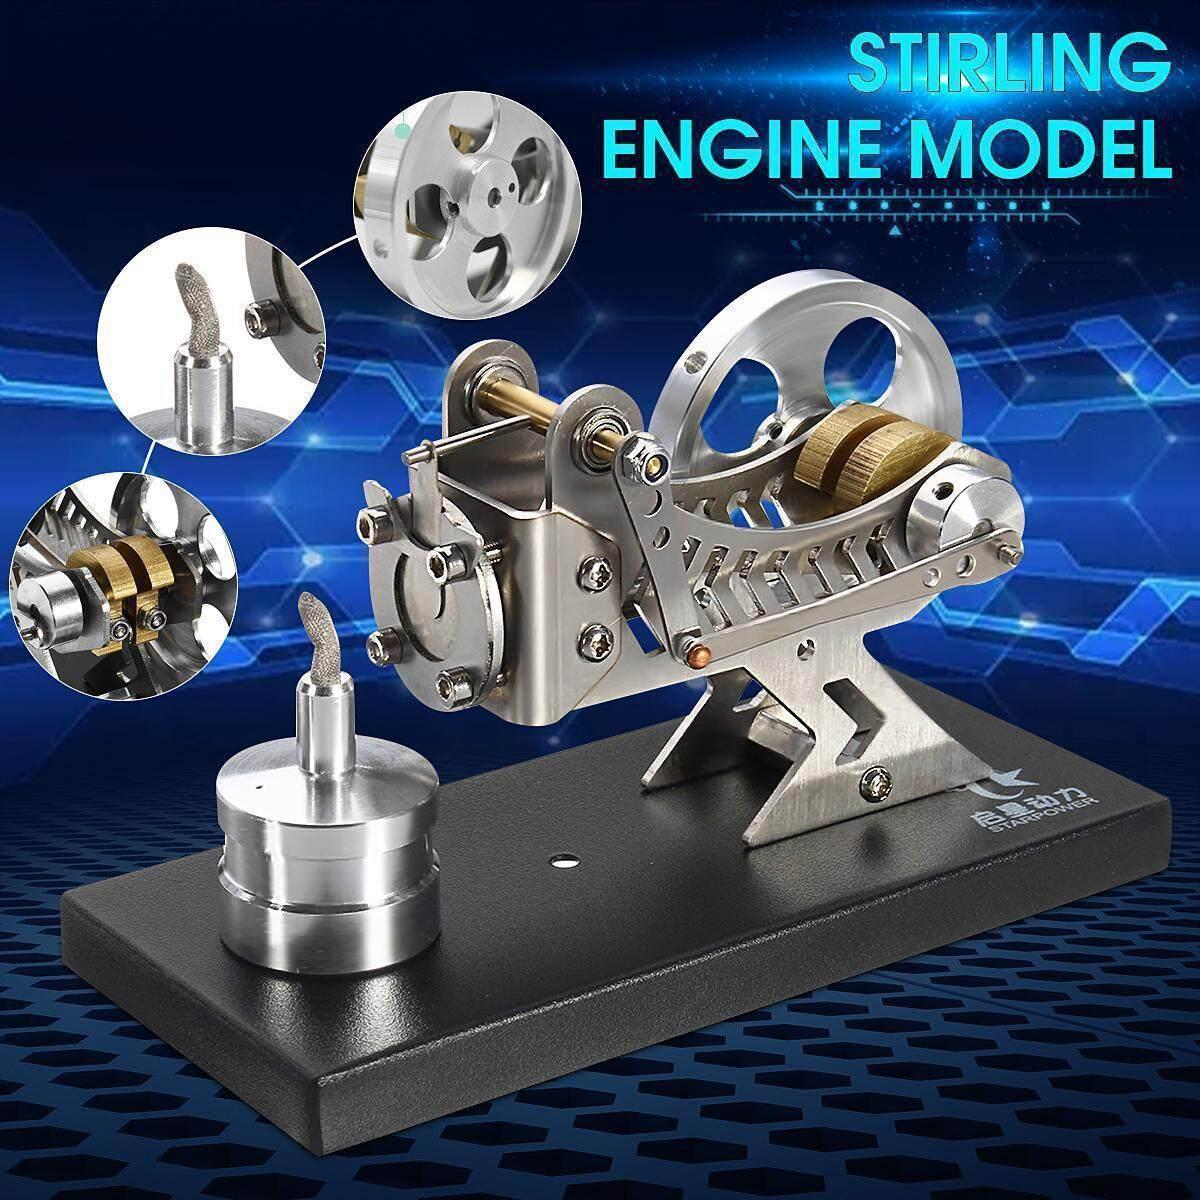 STARPOWER Live Vacuum Engine Hot Air Stirling Engine Model Science Study  Developmental Toy